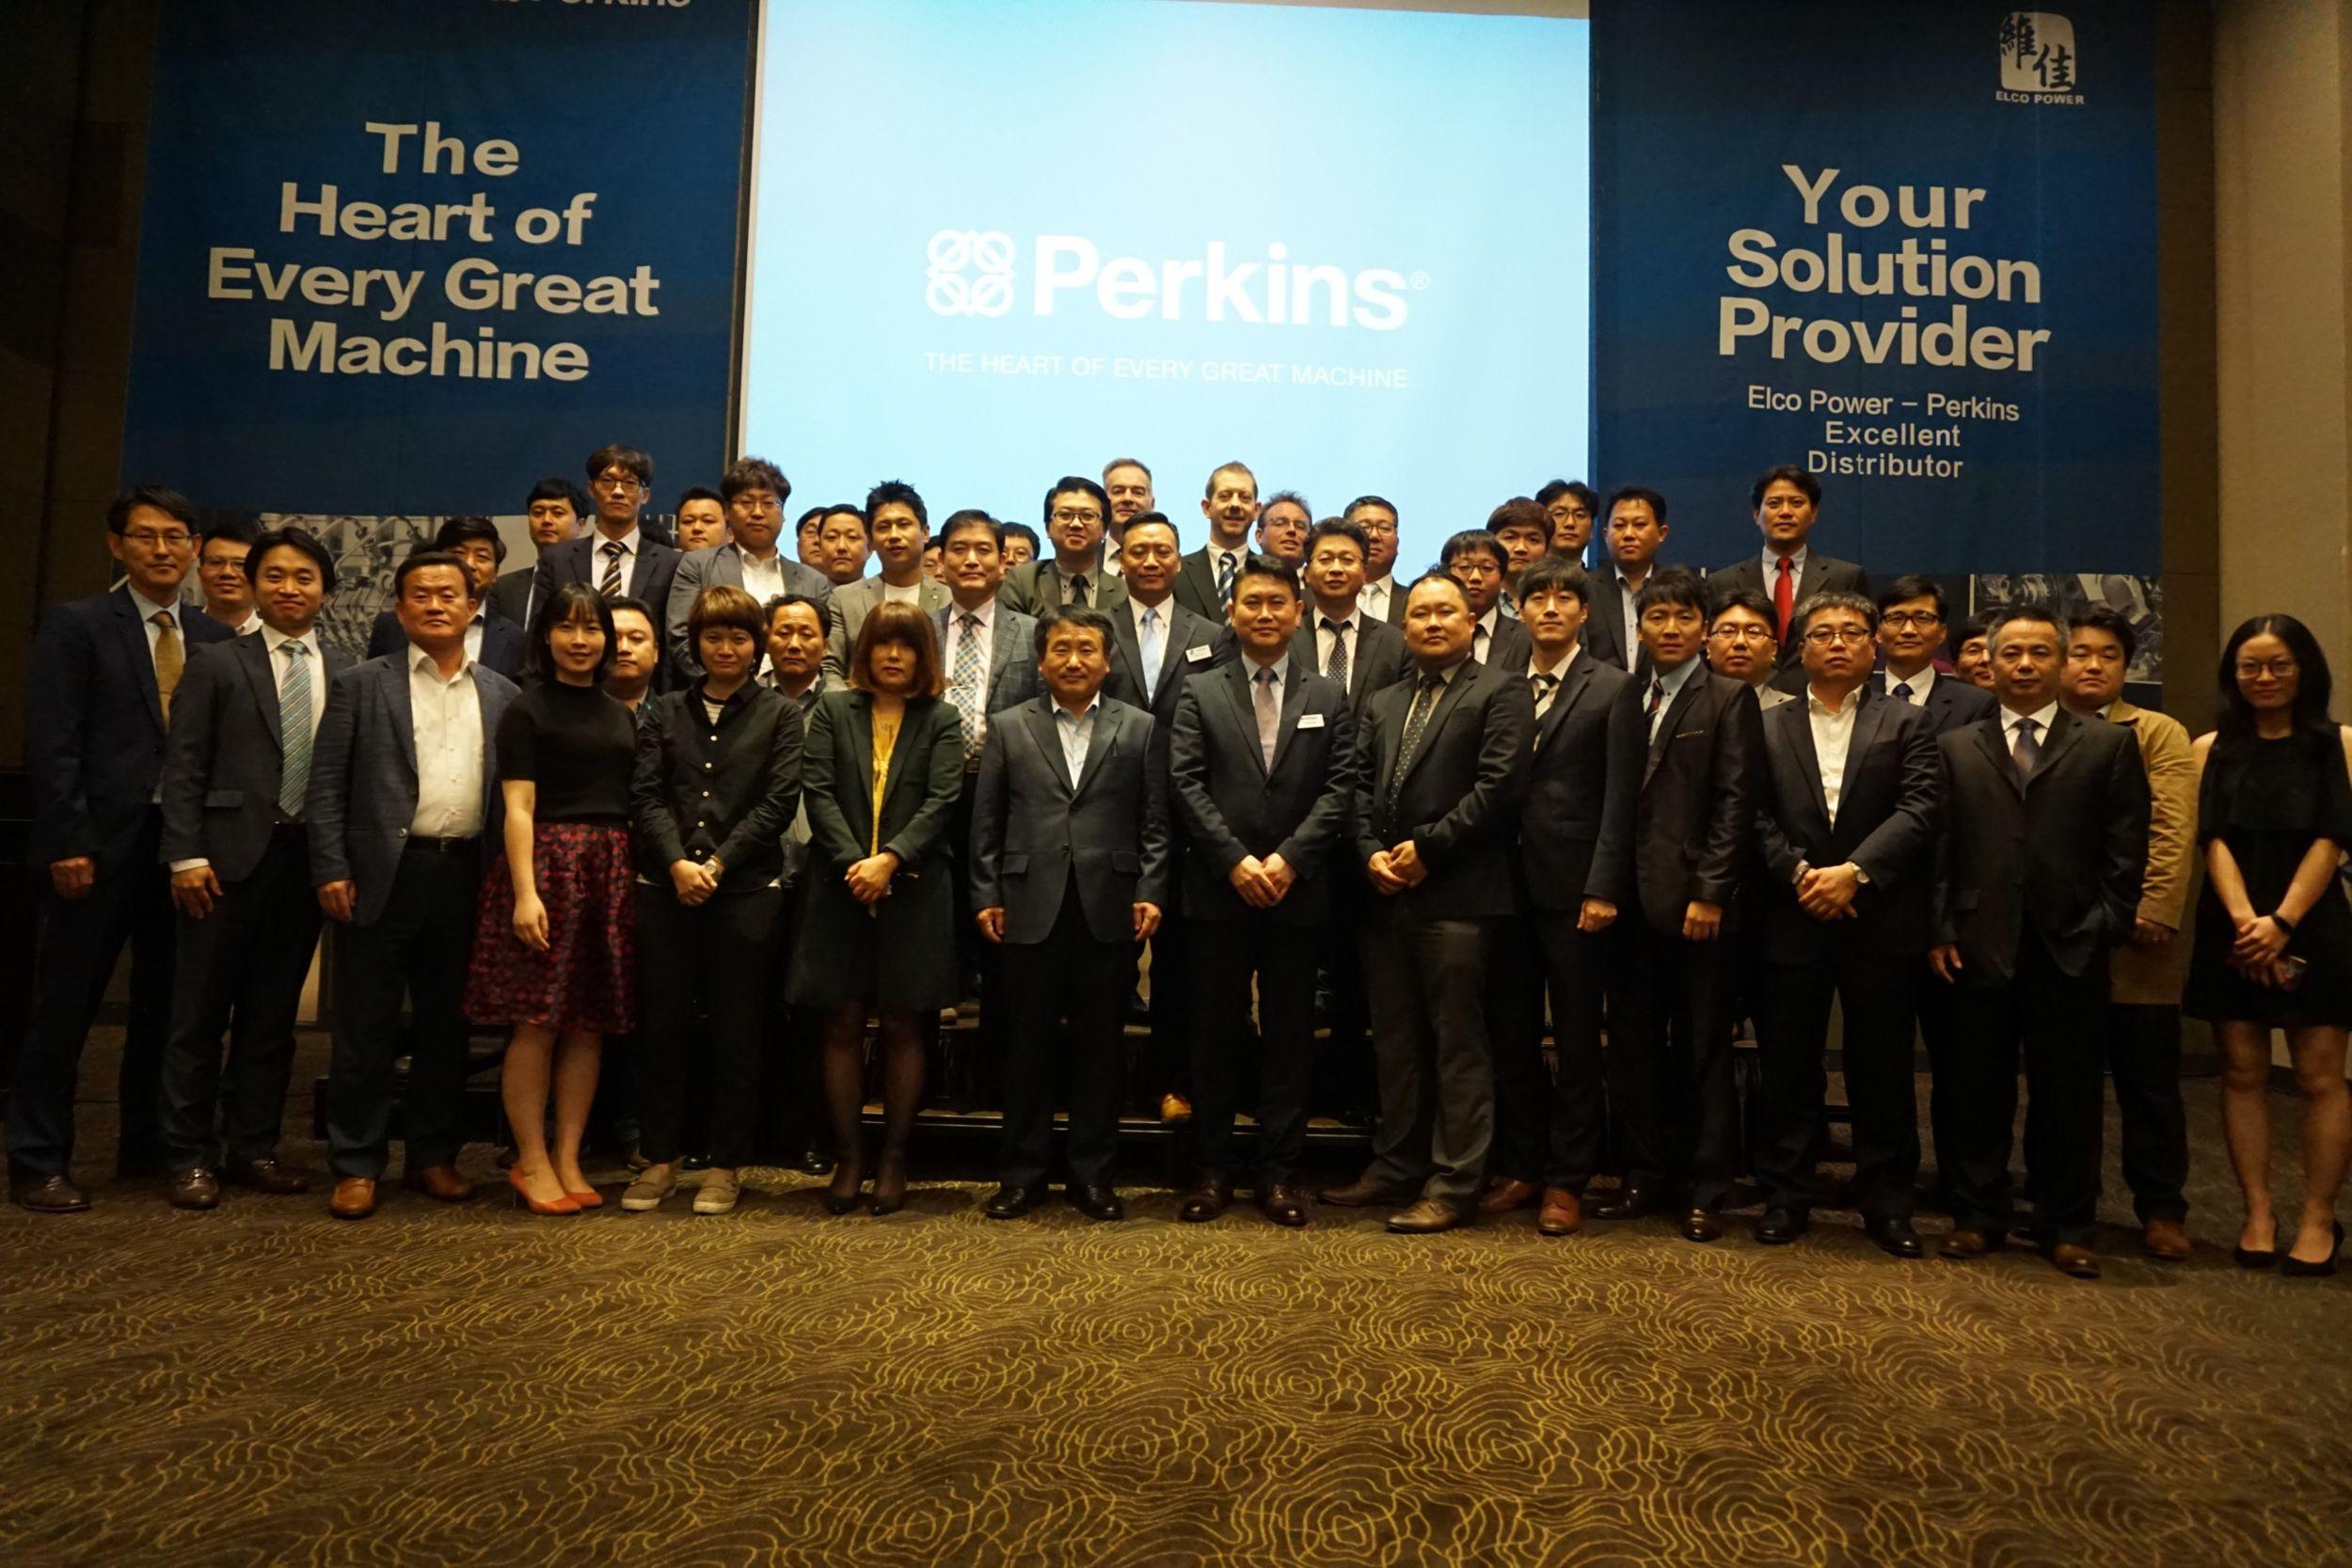 Perkins distributor Elco hosts electric power seminar in Korea